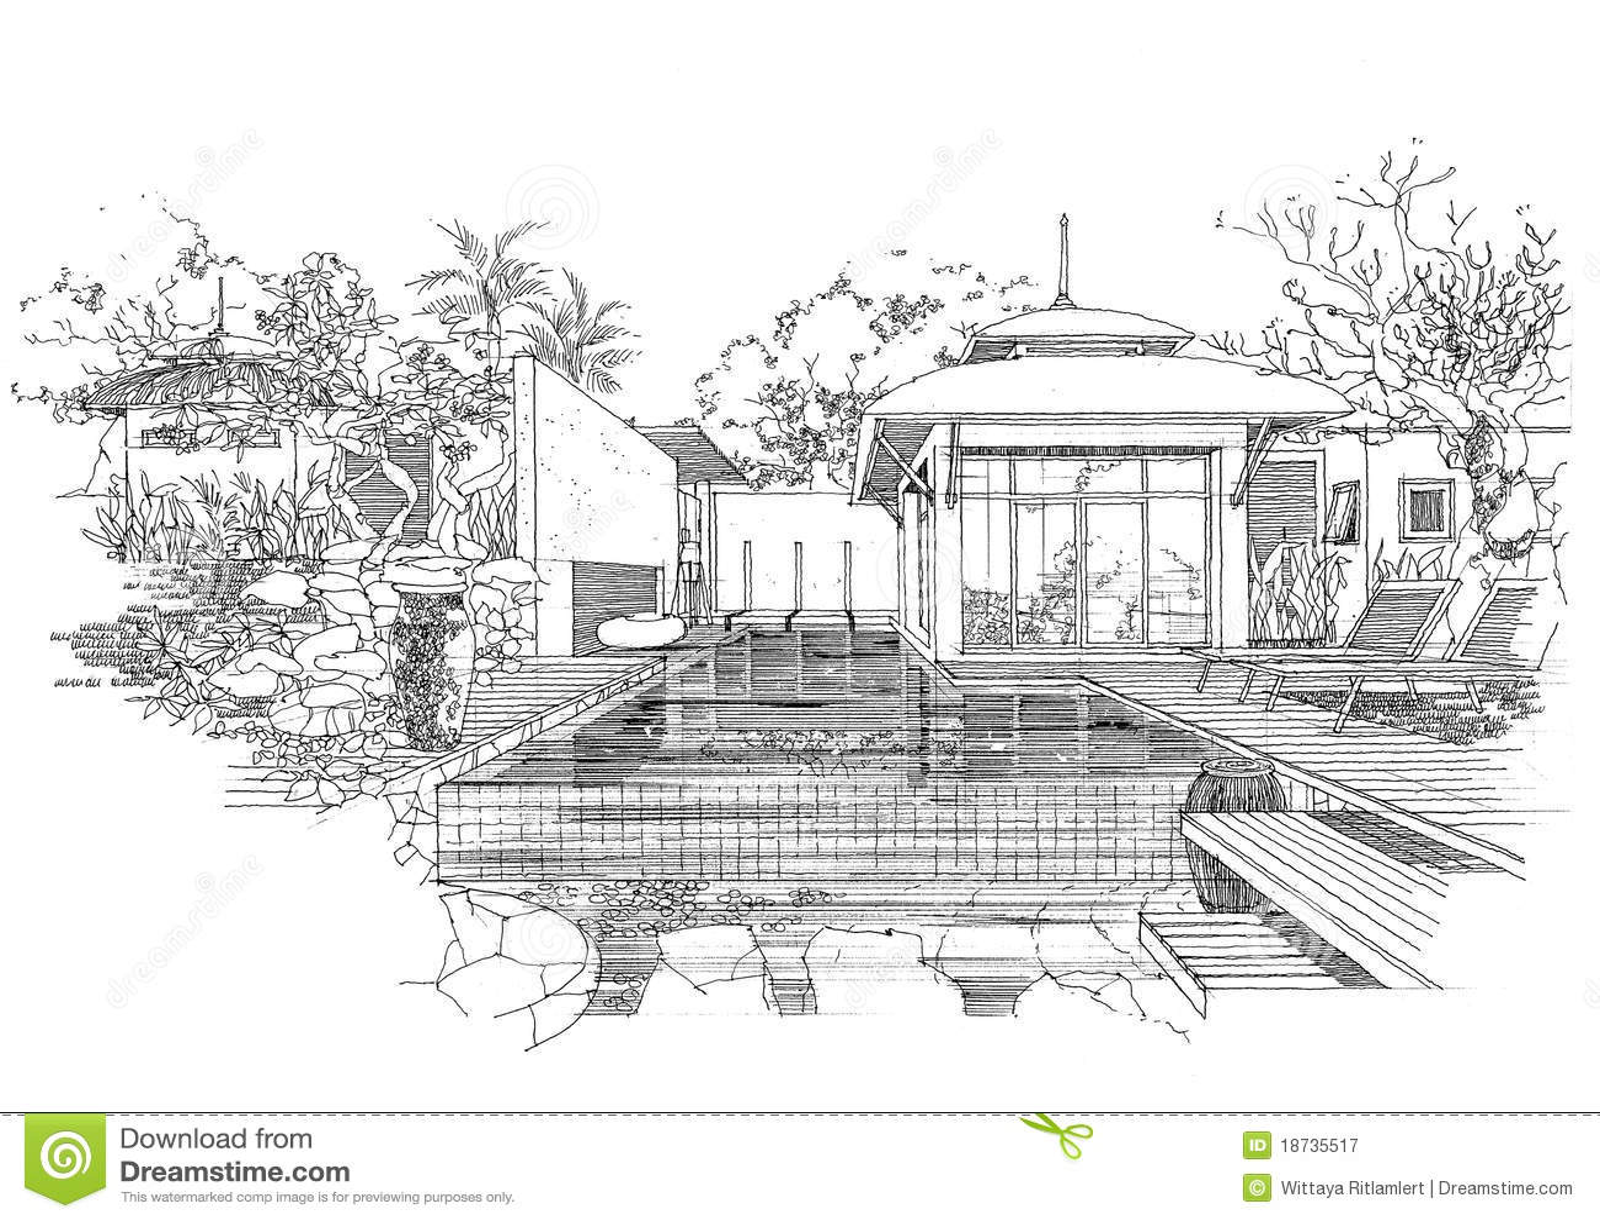 Interior architecture sketches